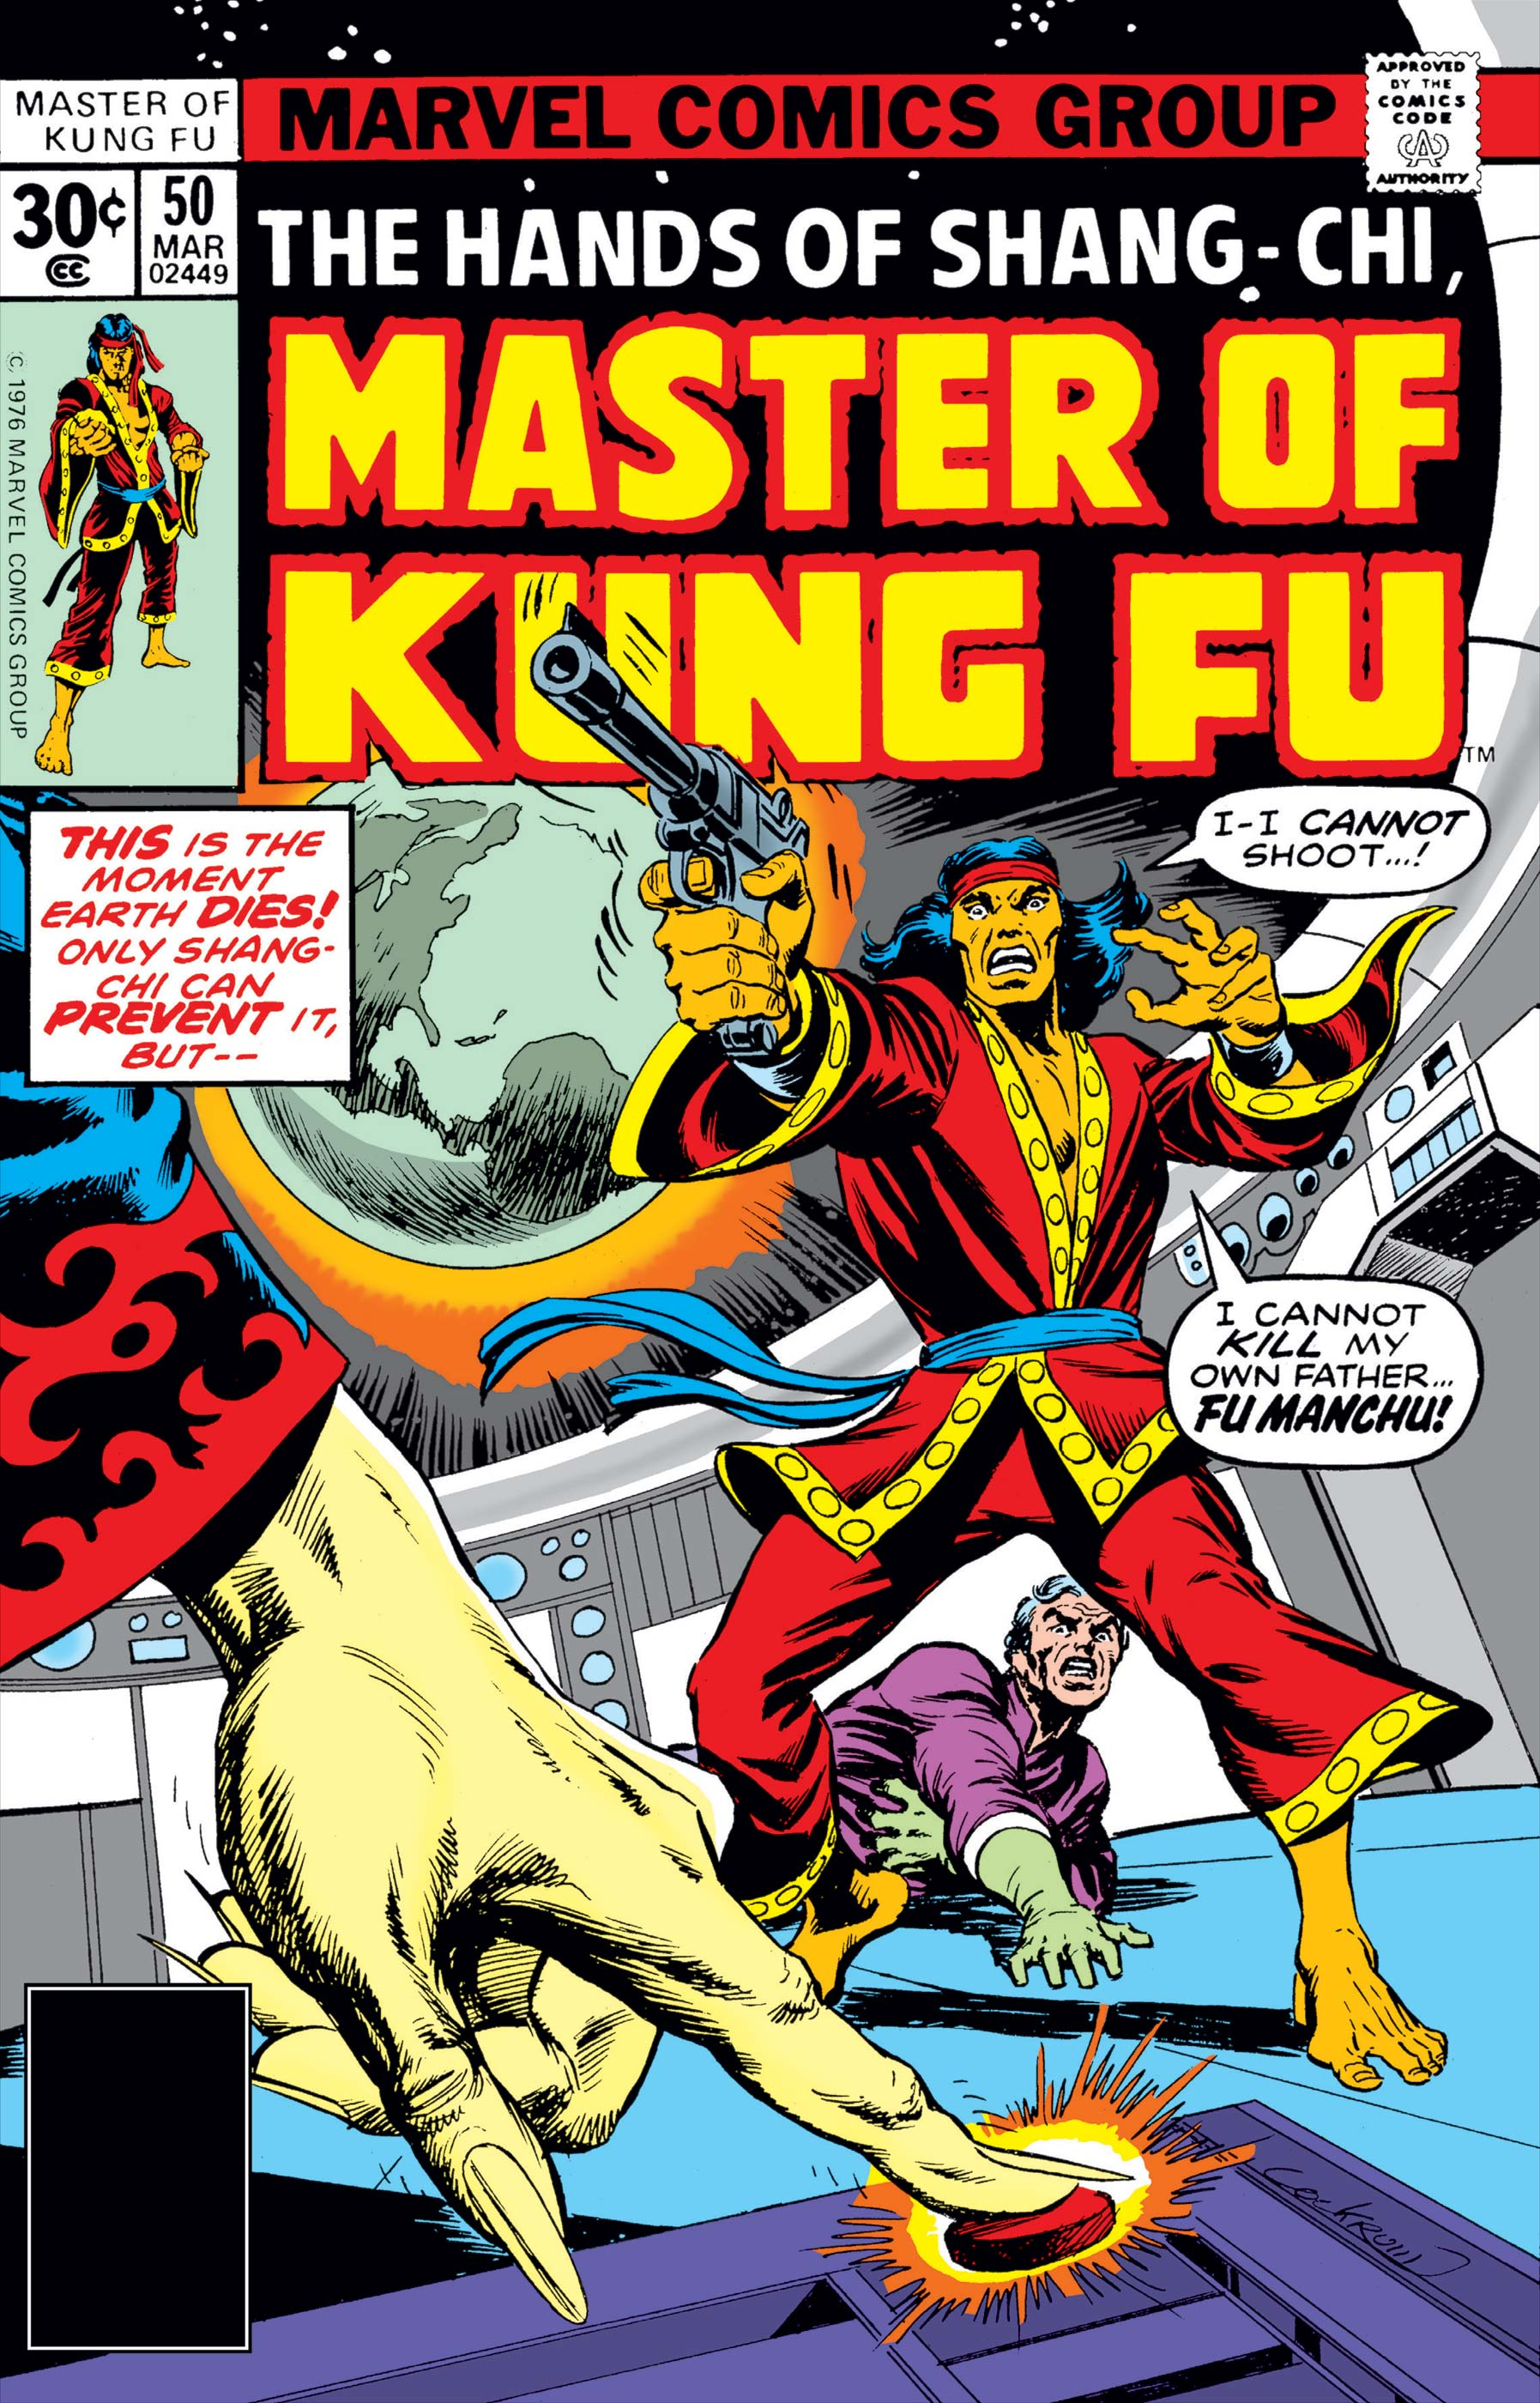 Master of Kung Fu (1974) #50